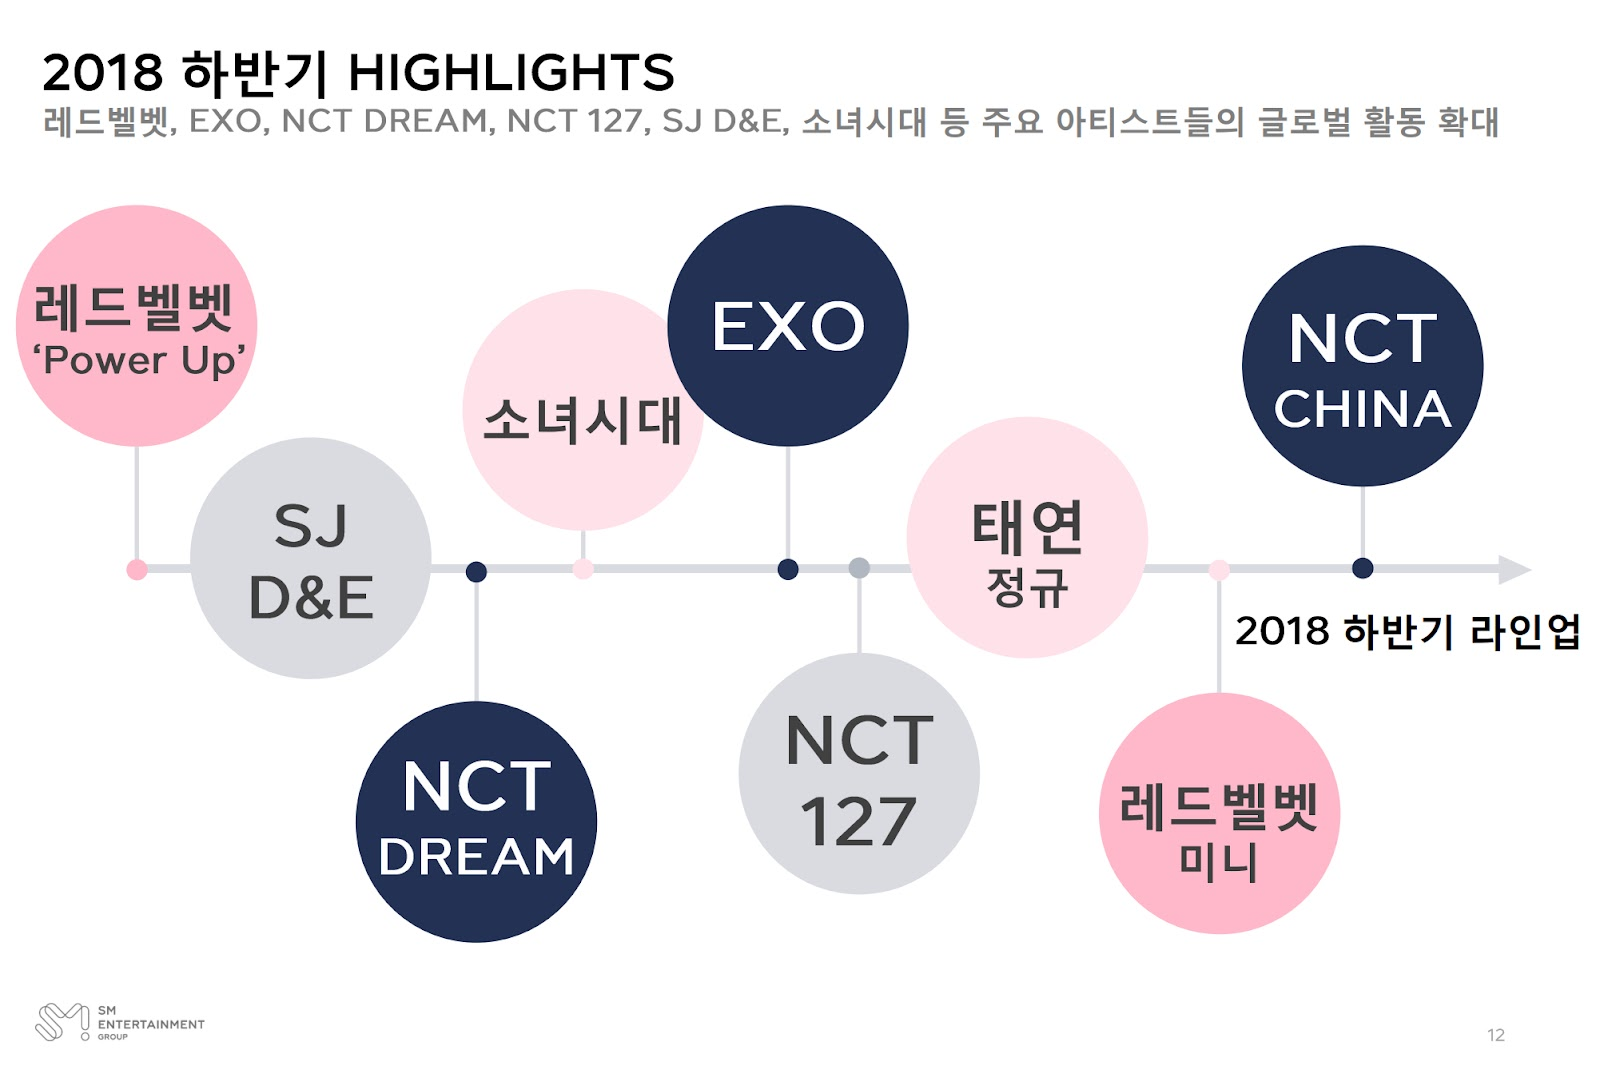 sm entertainment 2018 later half highlight